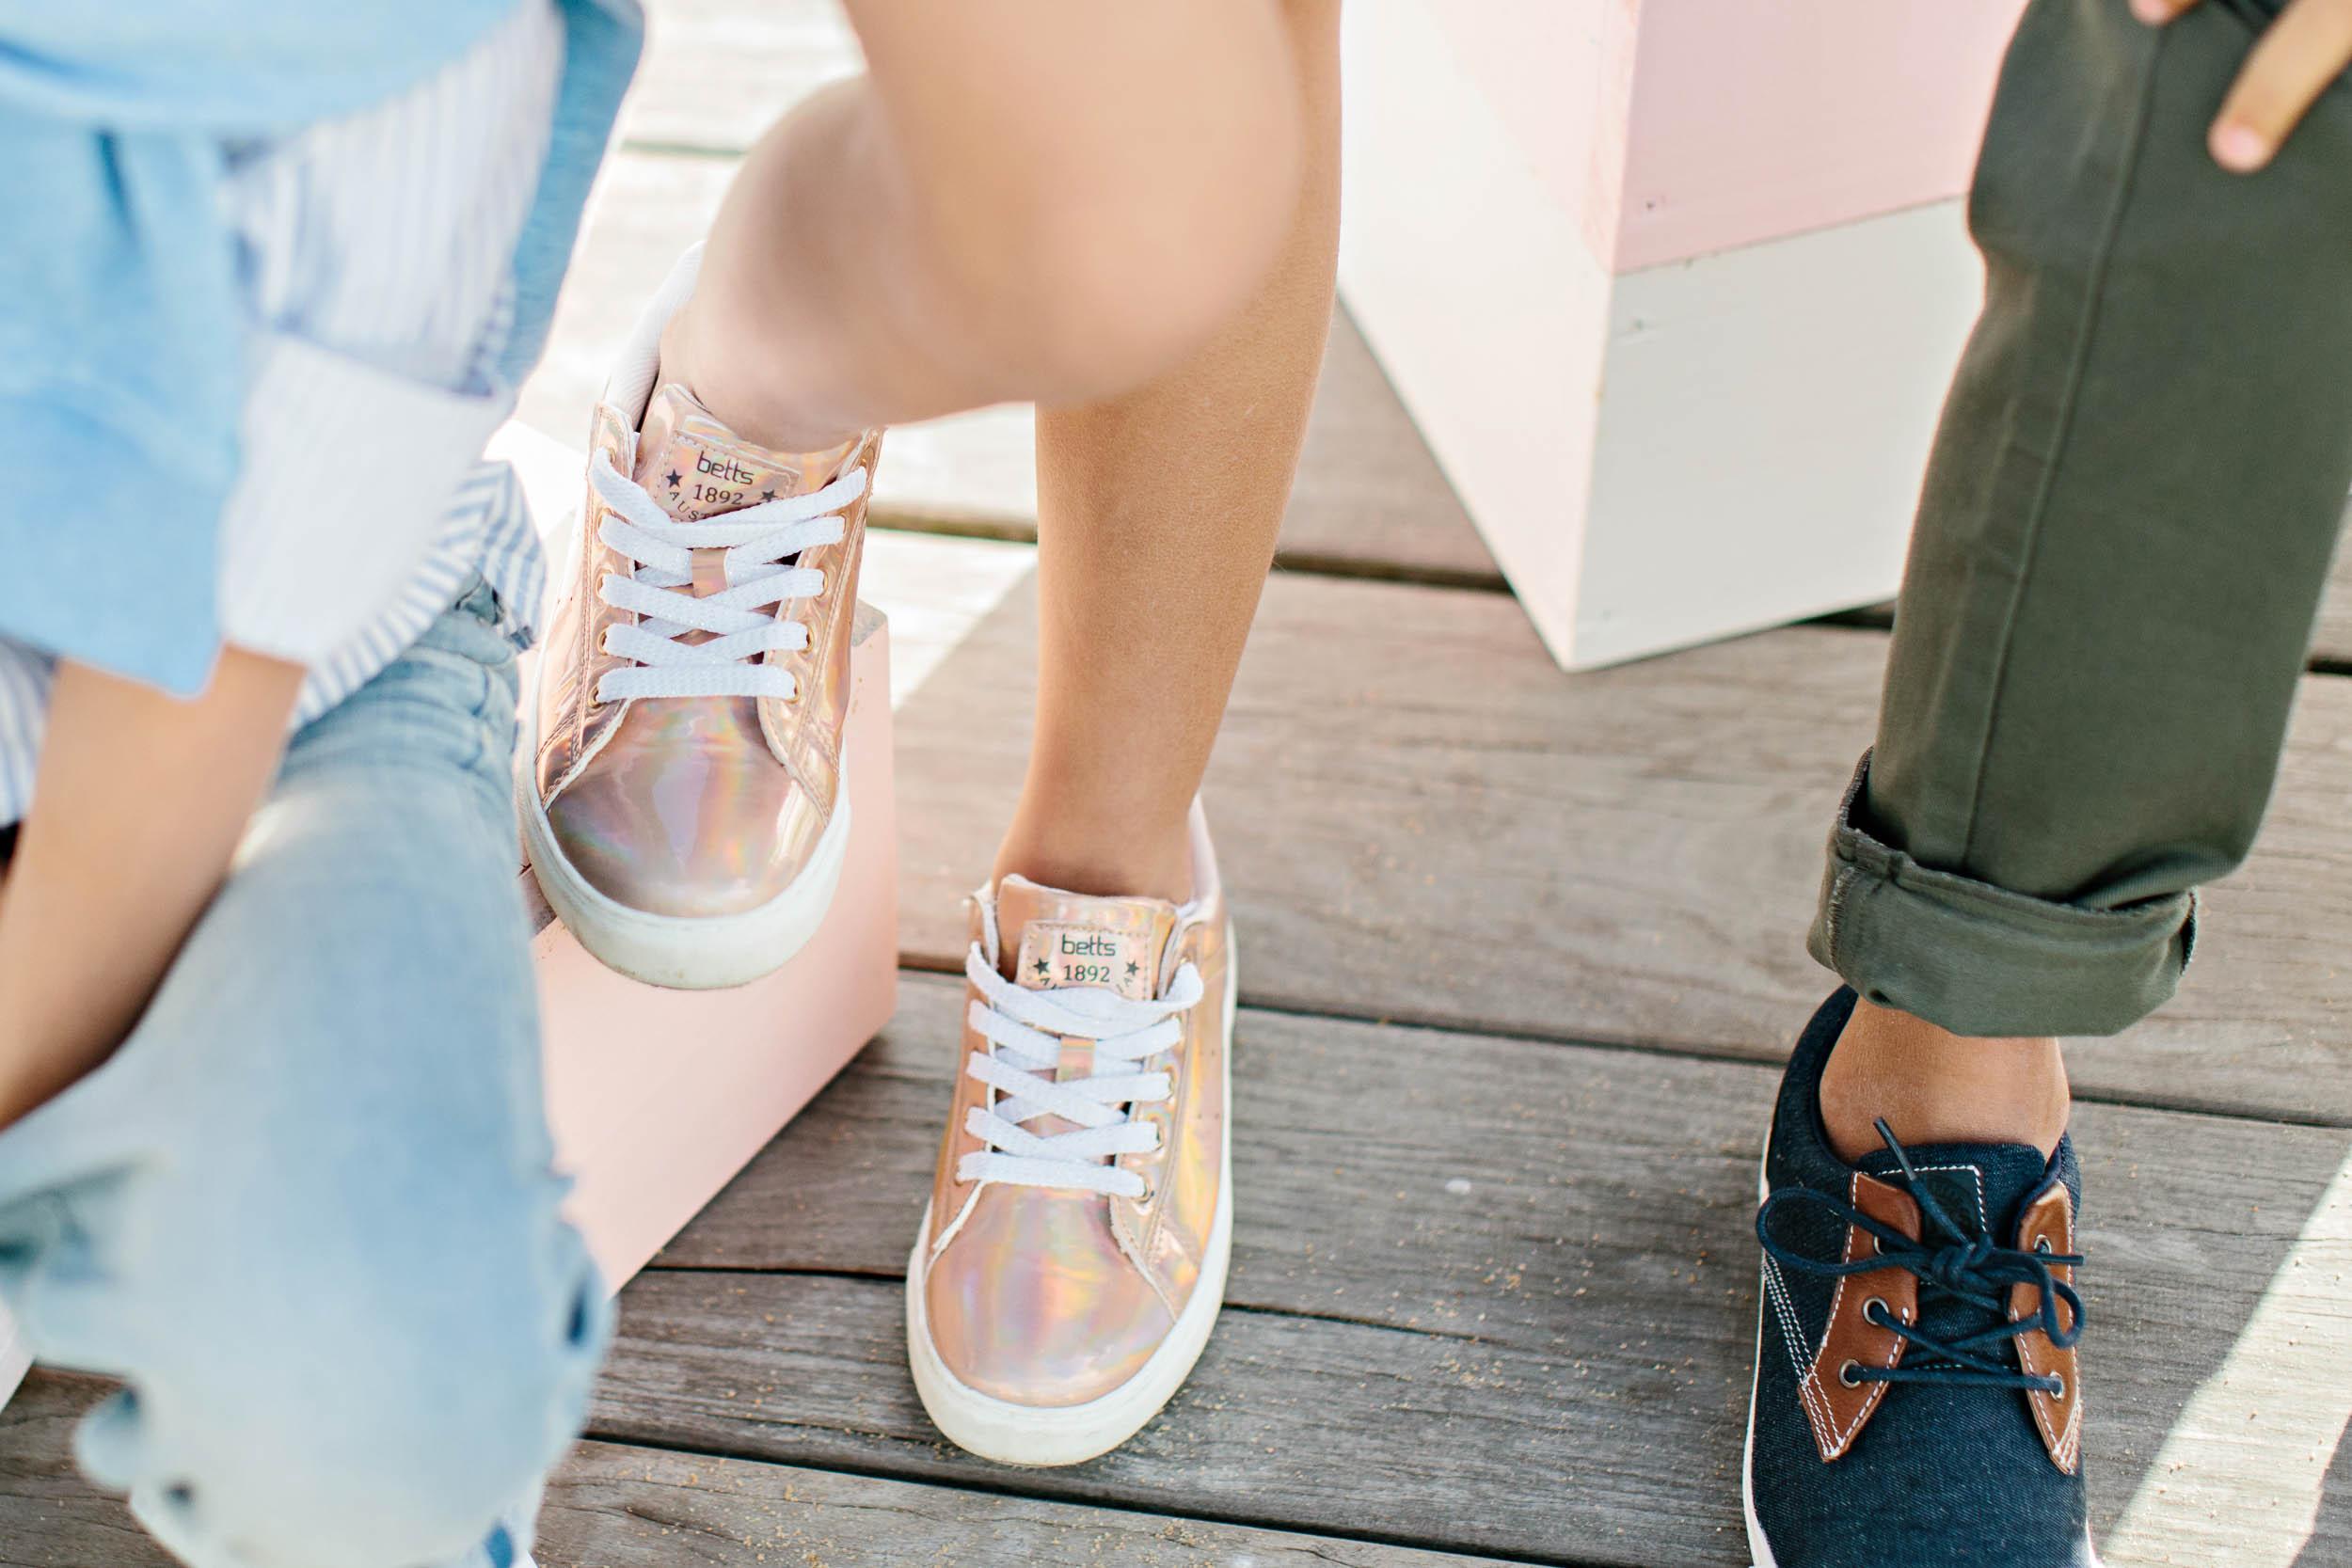 Kas-Richards-LENZO_Betts-Kids-Shoes-313.jpg